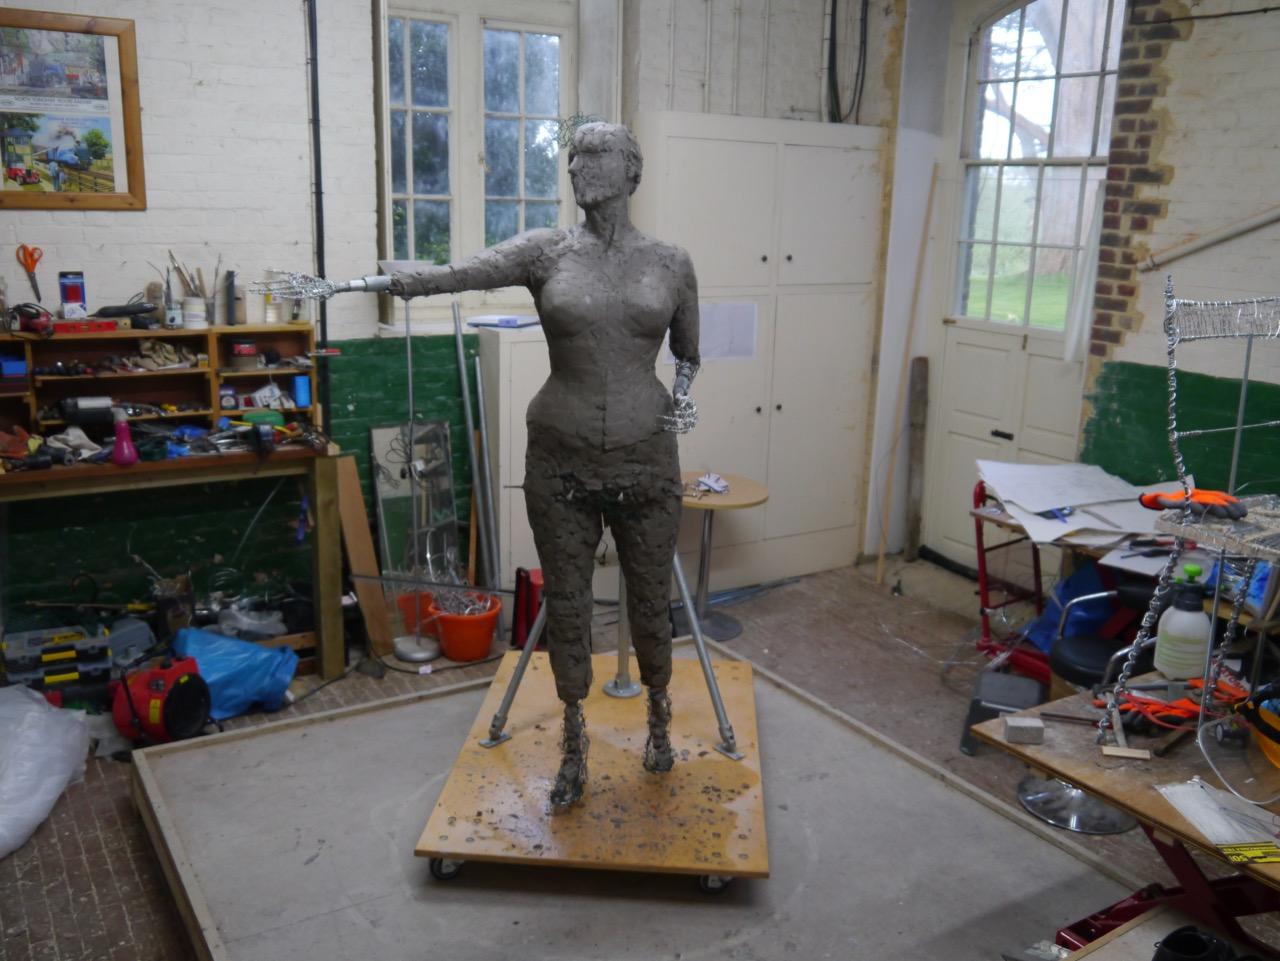 Our Emmeline: the unclothed figure